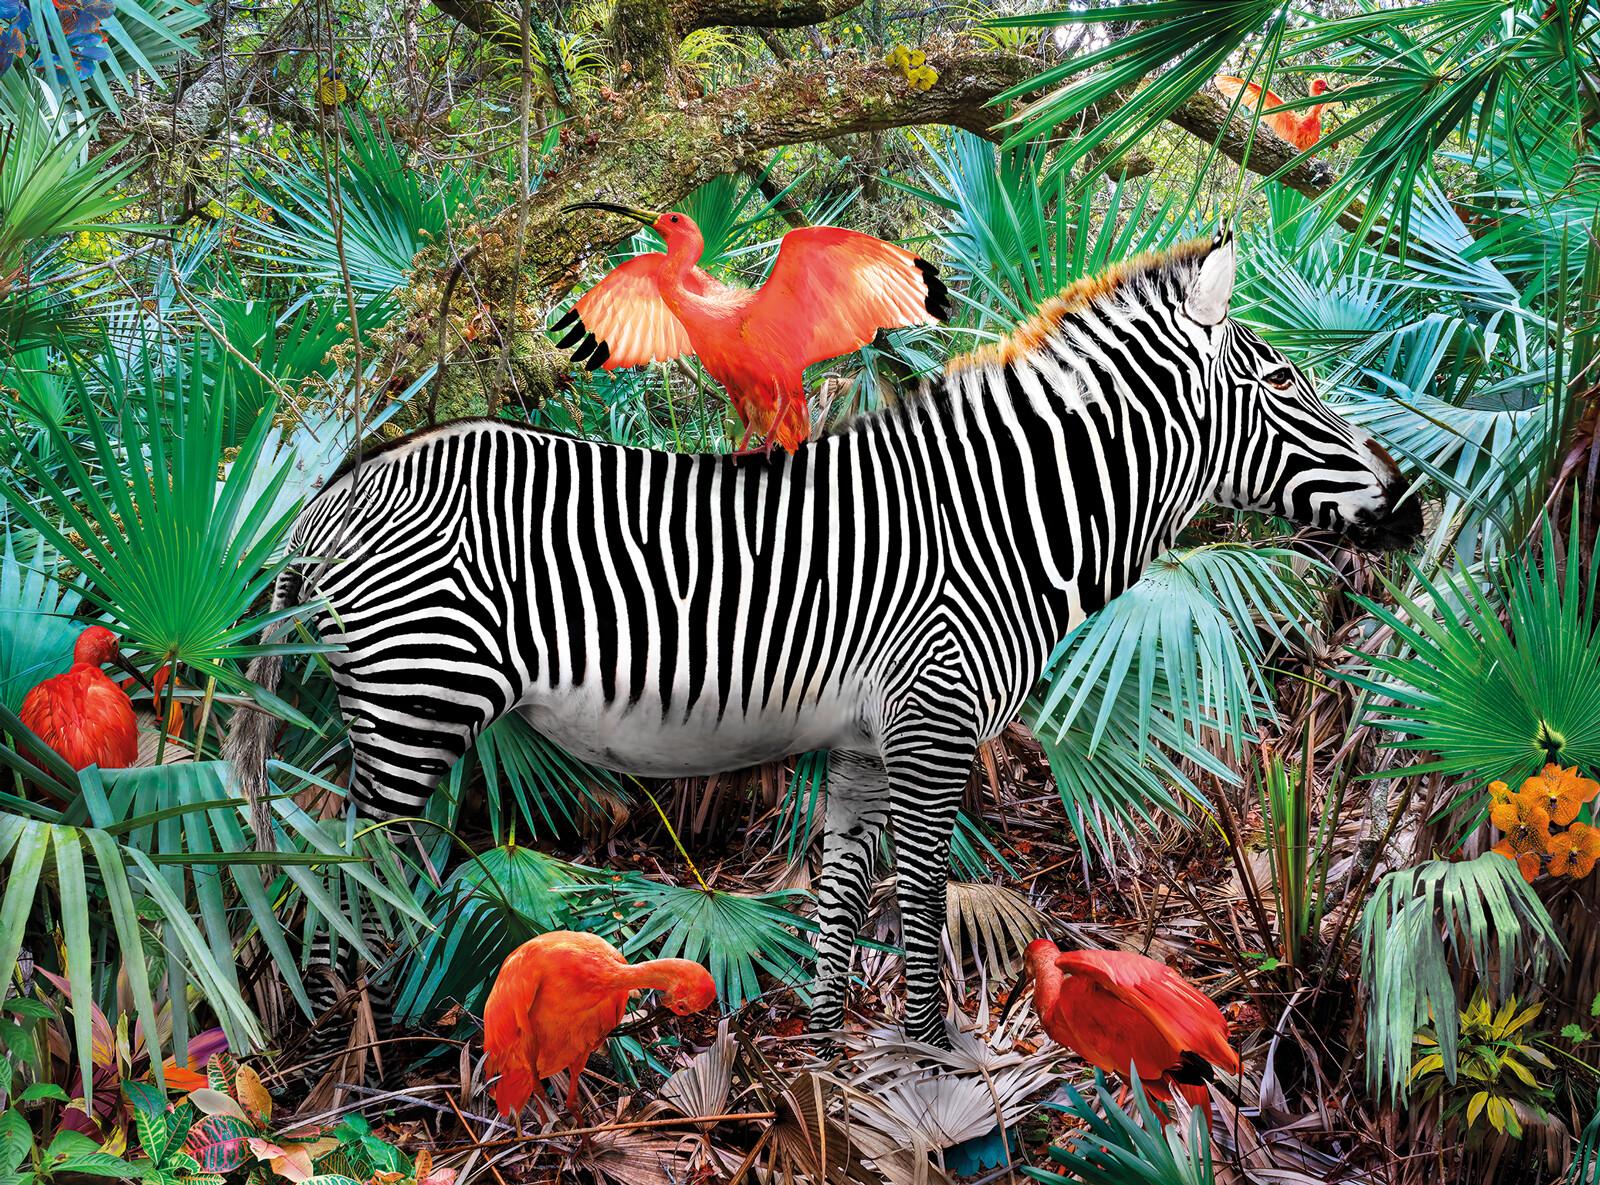 Ibises & Zebra - Pat Swain